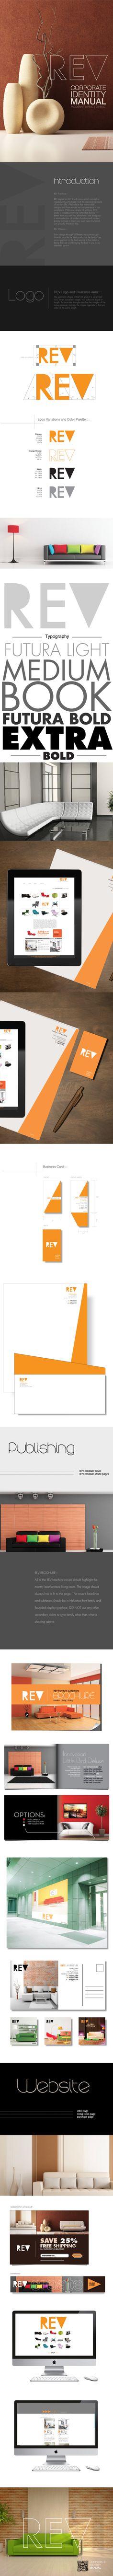 REV Furniture Corporate Identity on Behance